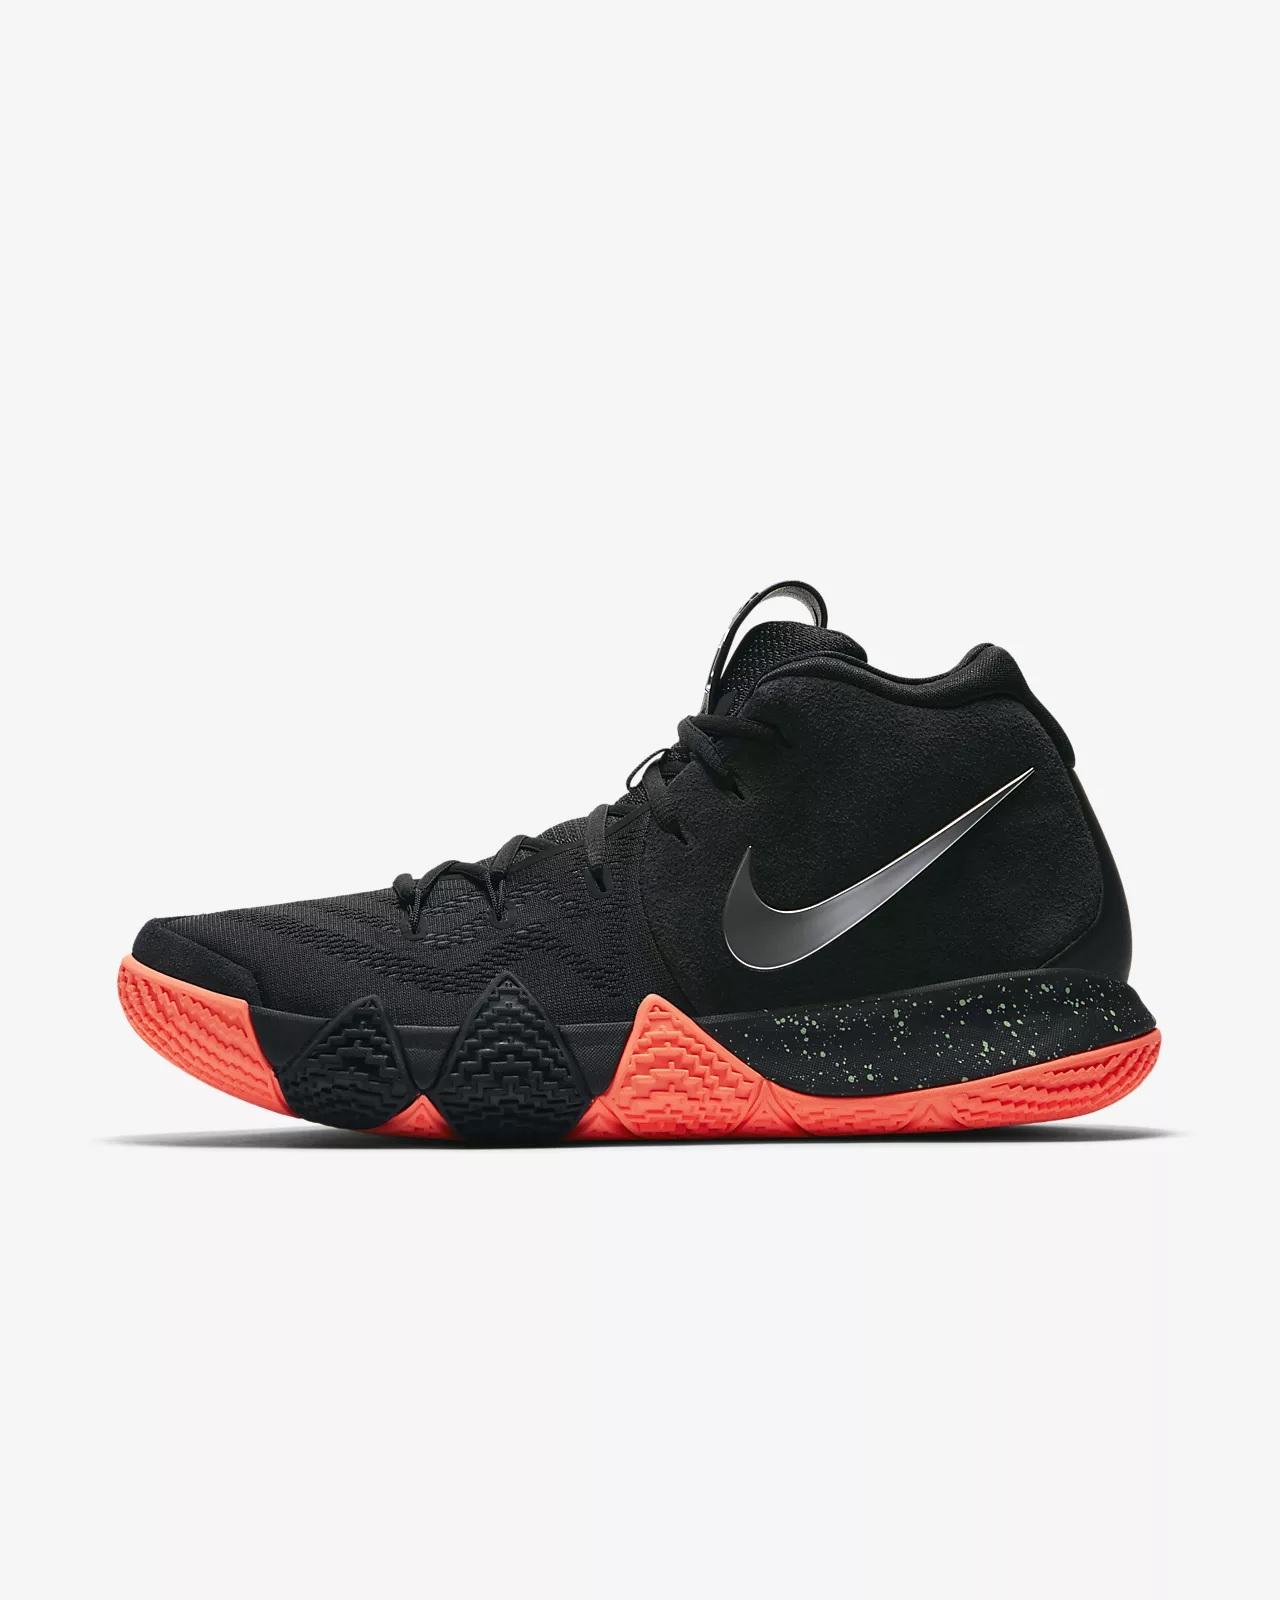 Nike kyrie 4 metallic